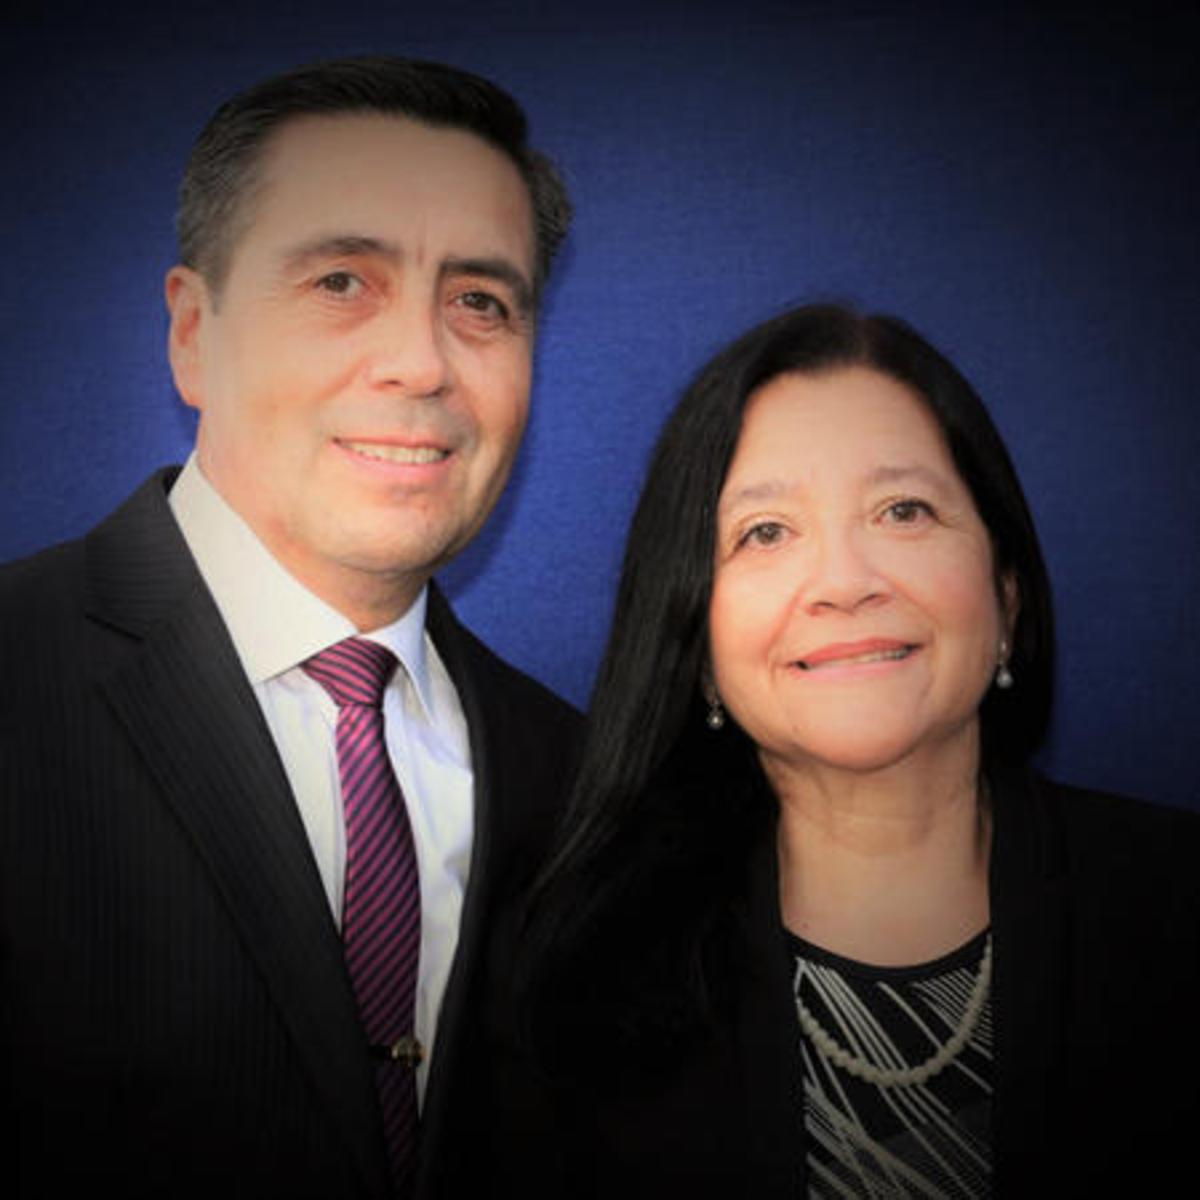 PM_Correa_Cardenas.jpg